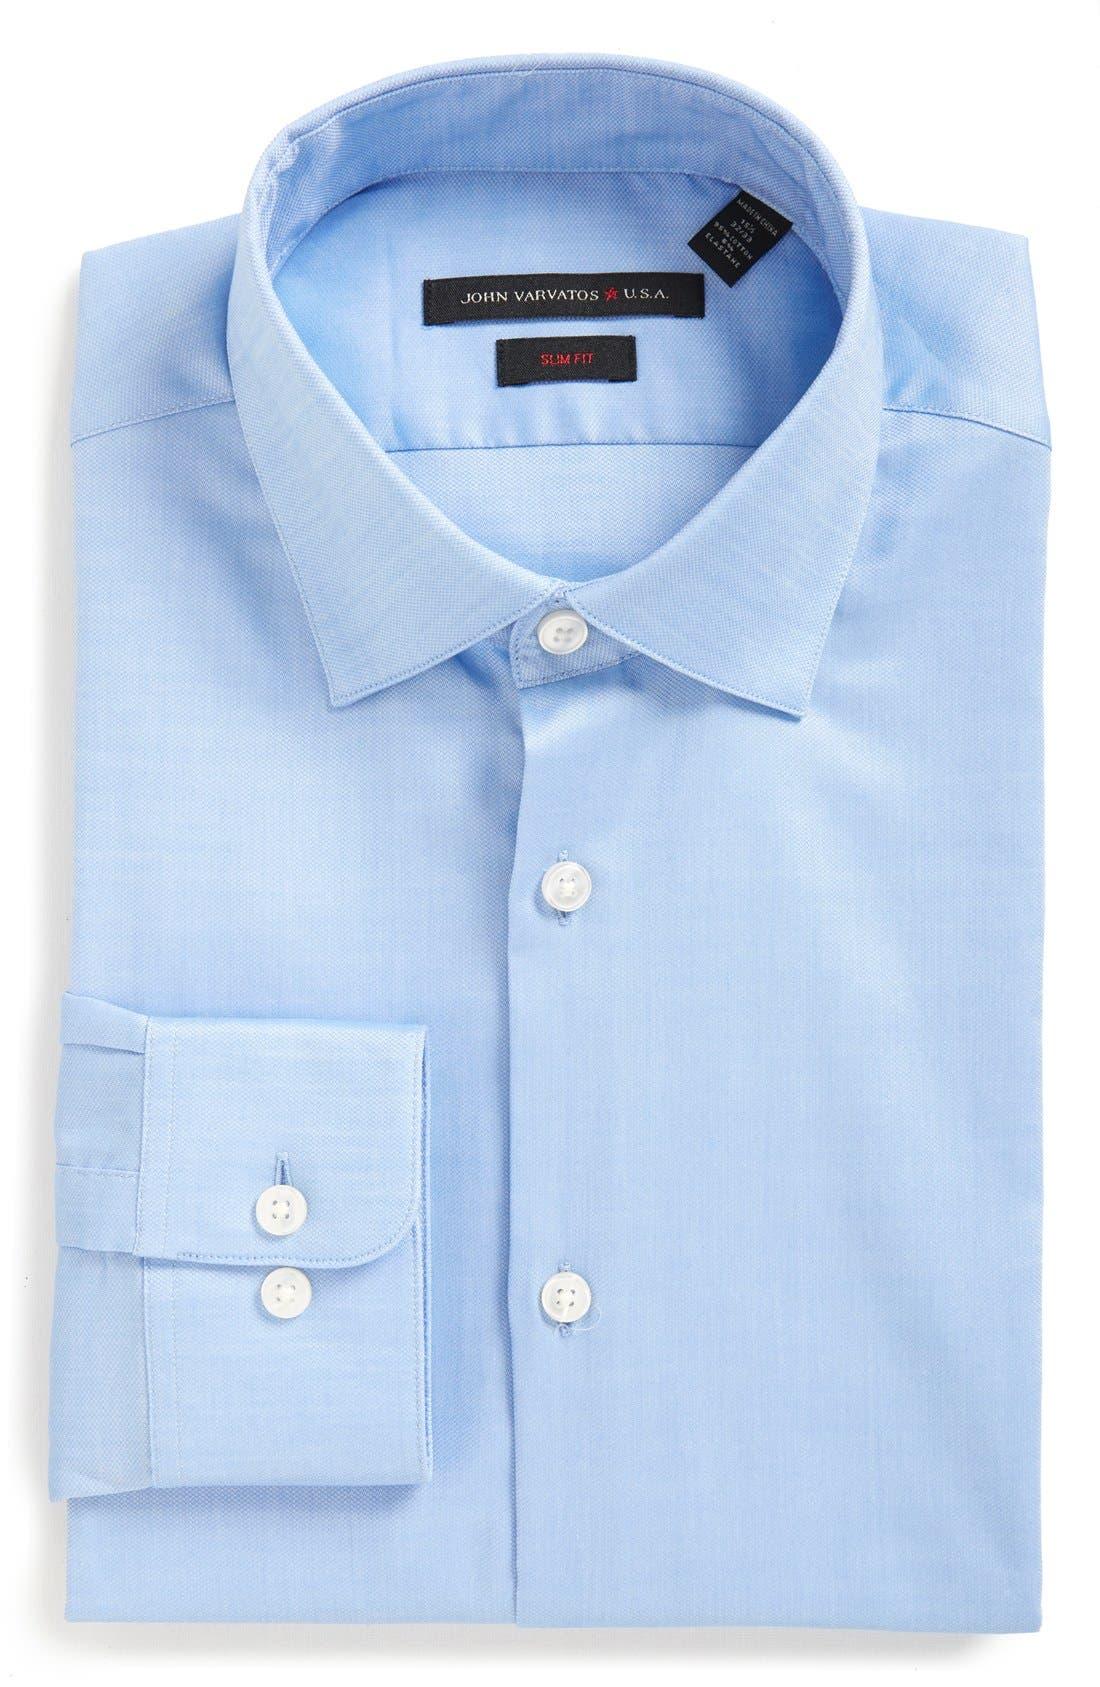 Soho Slim Fit Stretch Solid Dress Shirt,                         Main,                         color, ATLANTIC BLUE